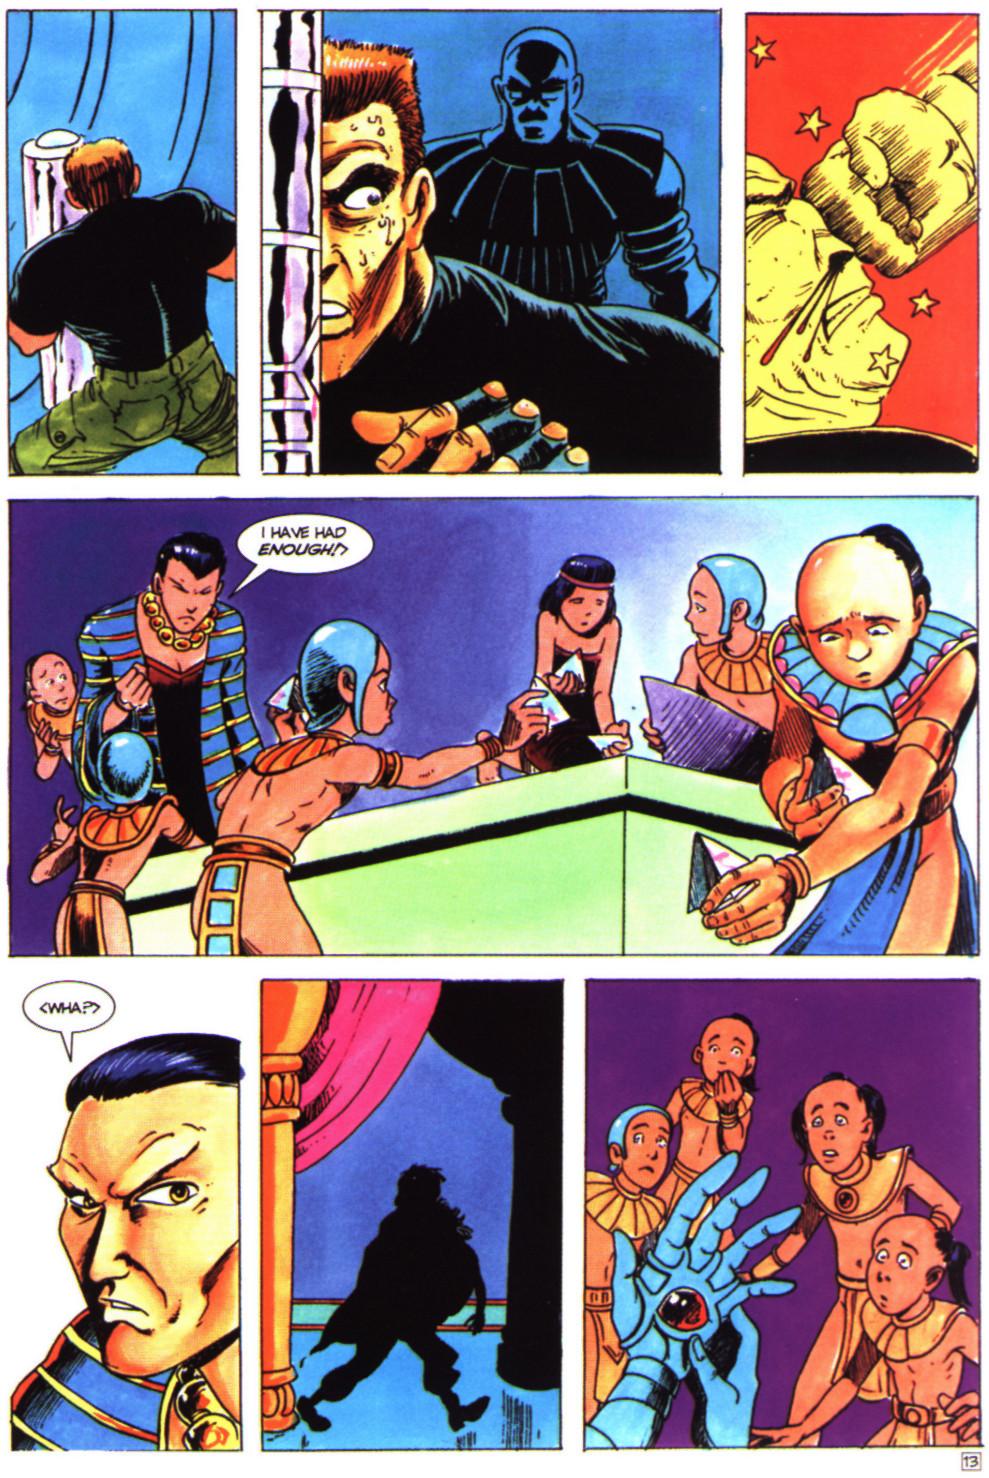 Read online Stargate comic -  Issue #4 - 15